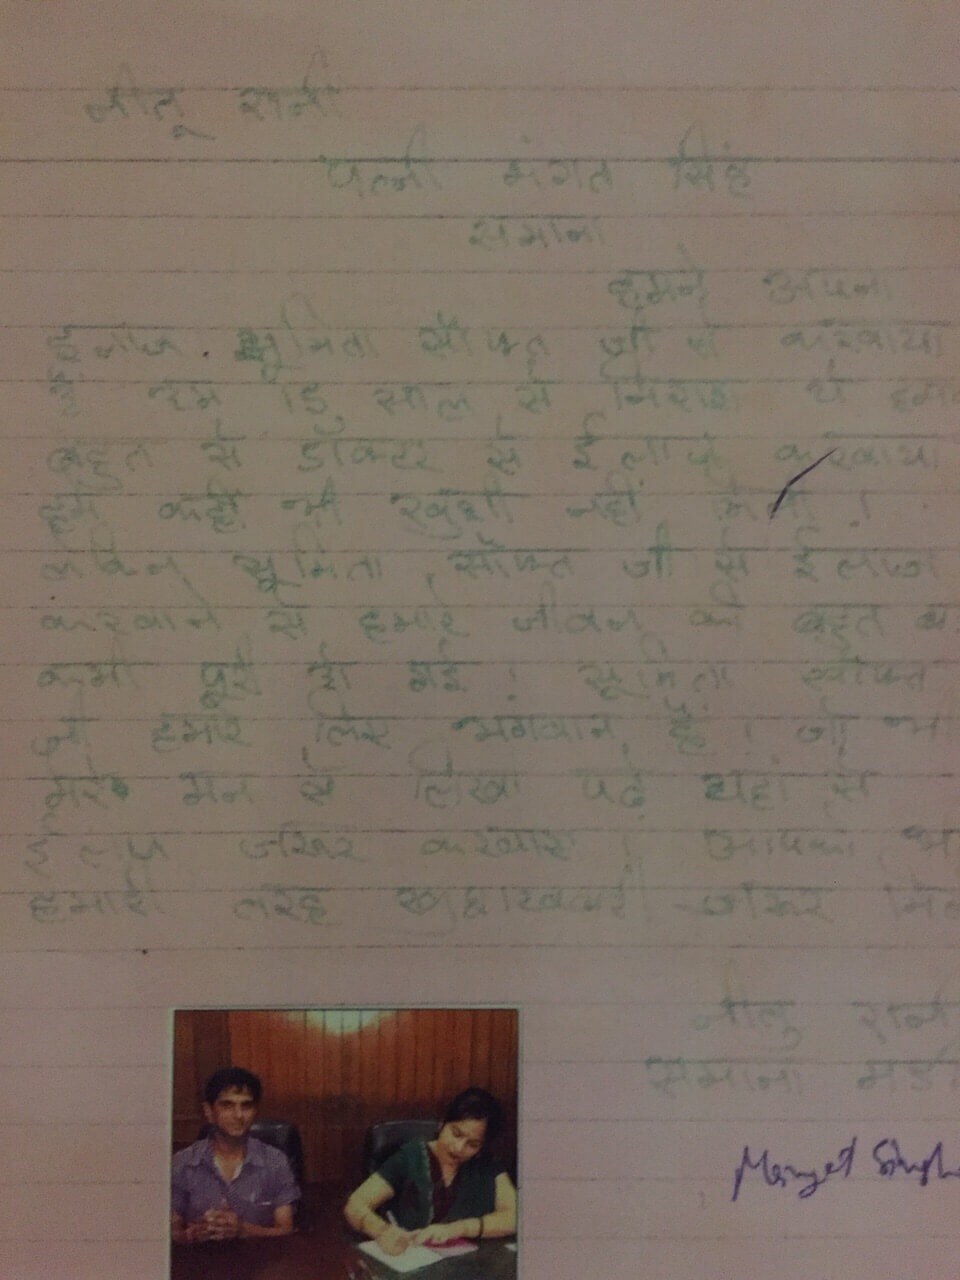 Mangat-Singh-Neelu-Rani